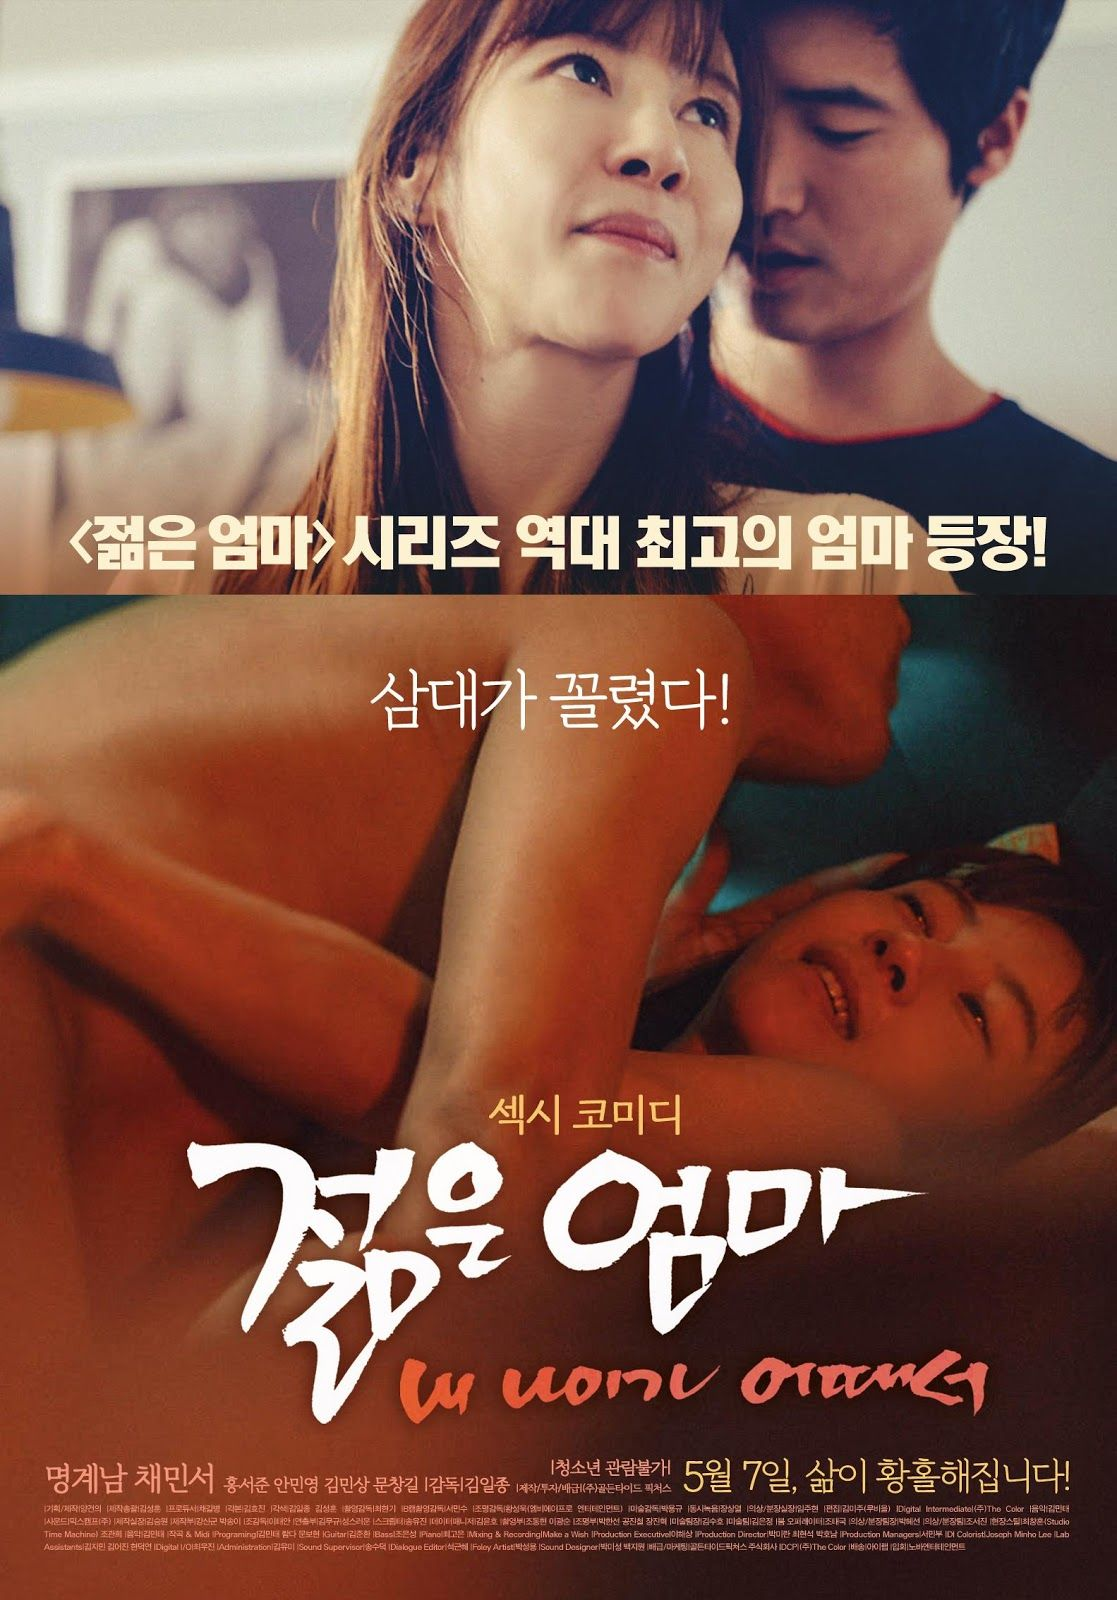 Download Film Korea Young Mother 3 Subtitle Indonesiadownload Film